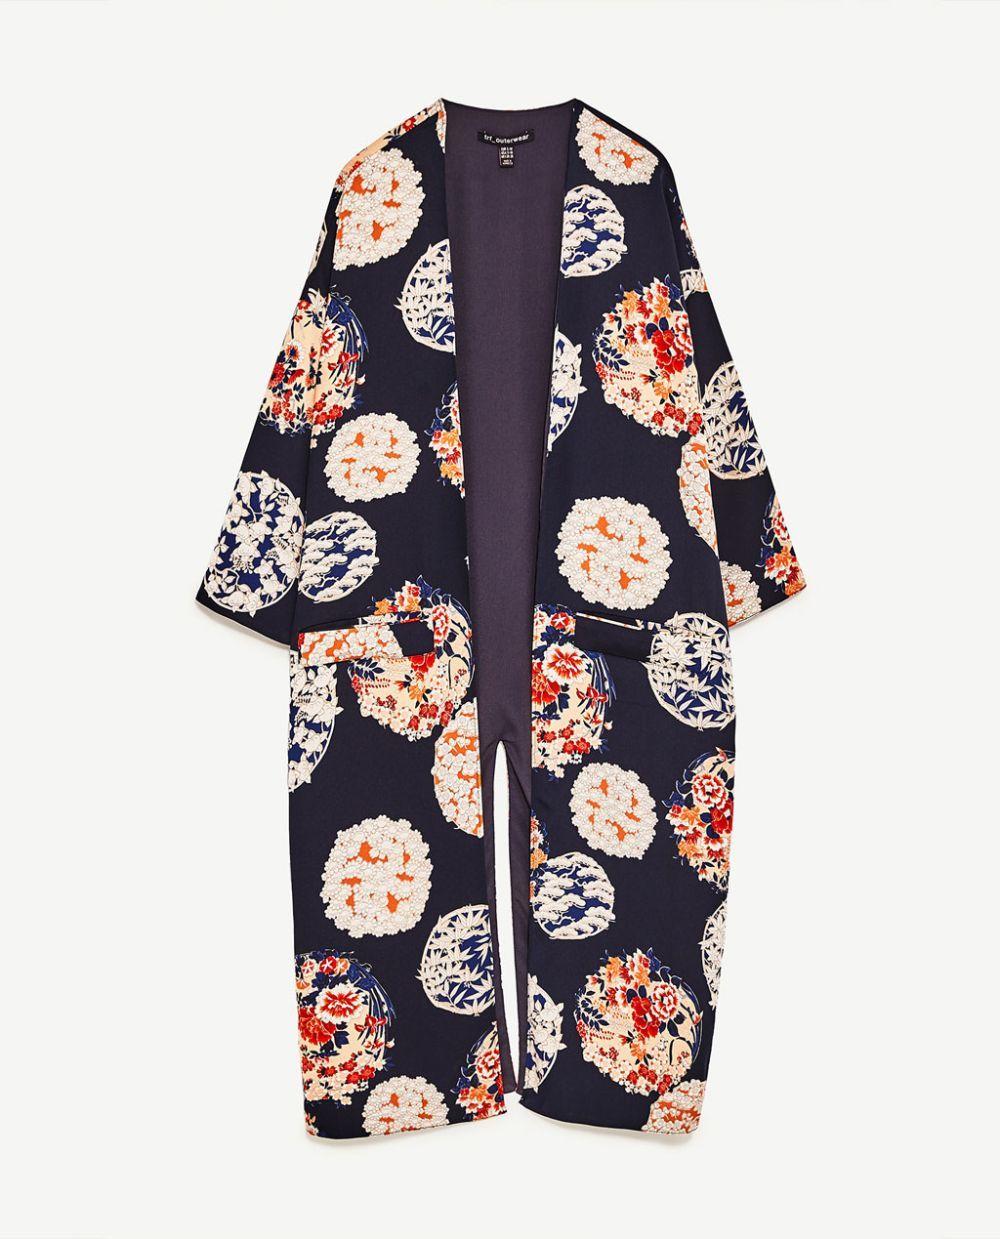 Chaqueta kimono estampada. De Zara (39,95 euros).